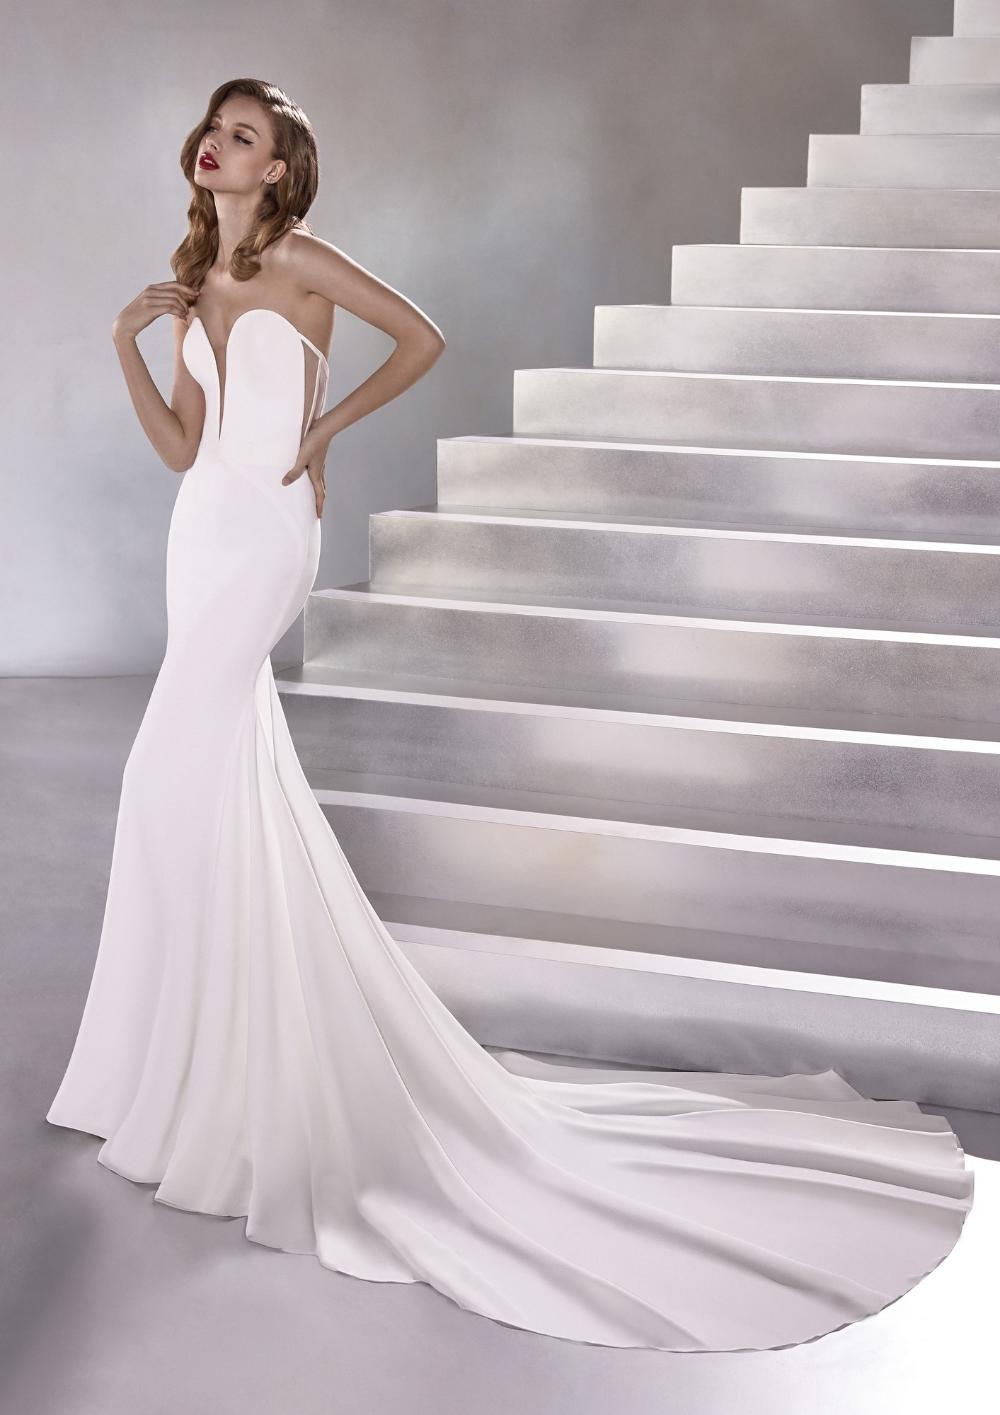 Wedding Dress Out Of Pronovias Lux Silhouette Mermaid Neckline Sweetheart Floor Pronovias Wedding Dress Wedding Dresses Wedding Dresses Mermaid Sweetheart [ 1415 x 1000 Pixel ]